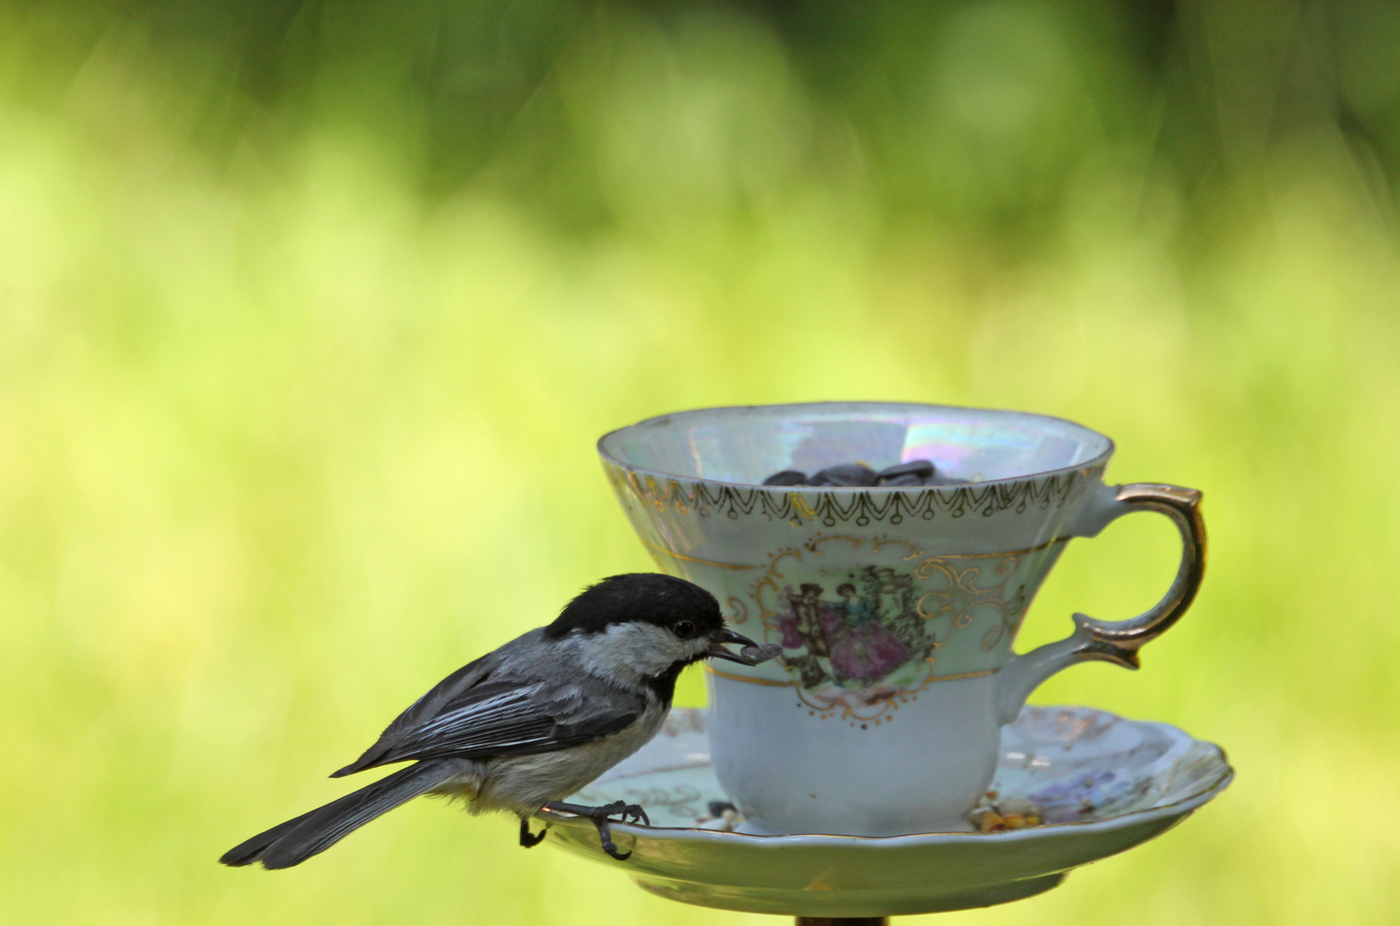 Chickadee at Teacup #6